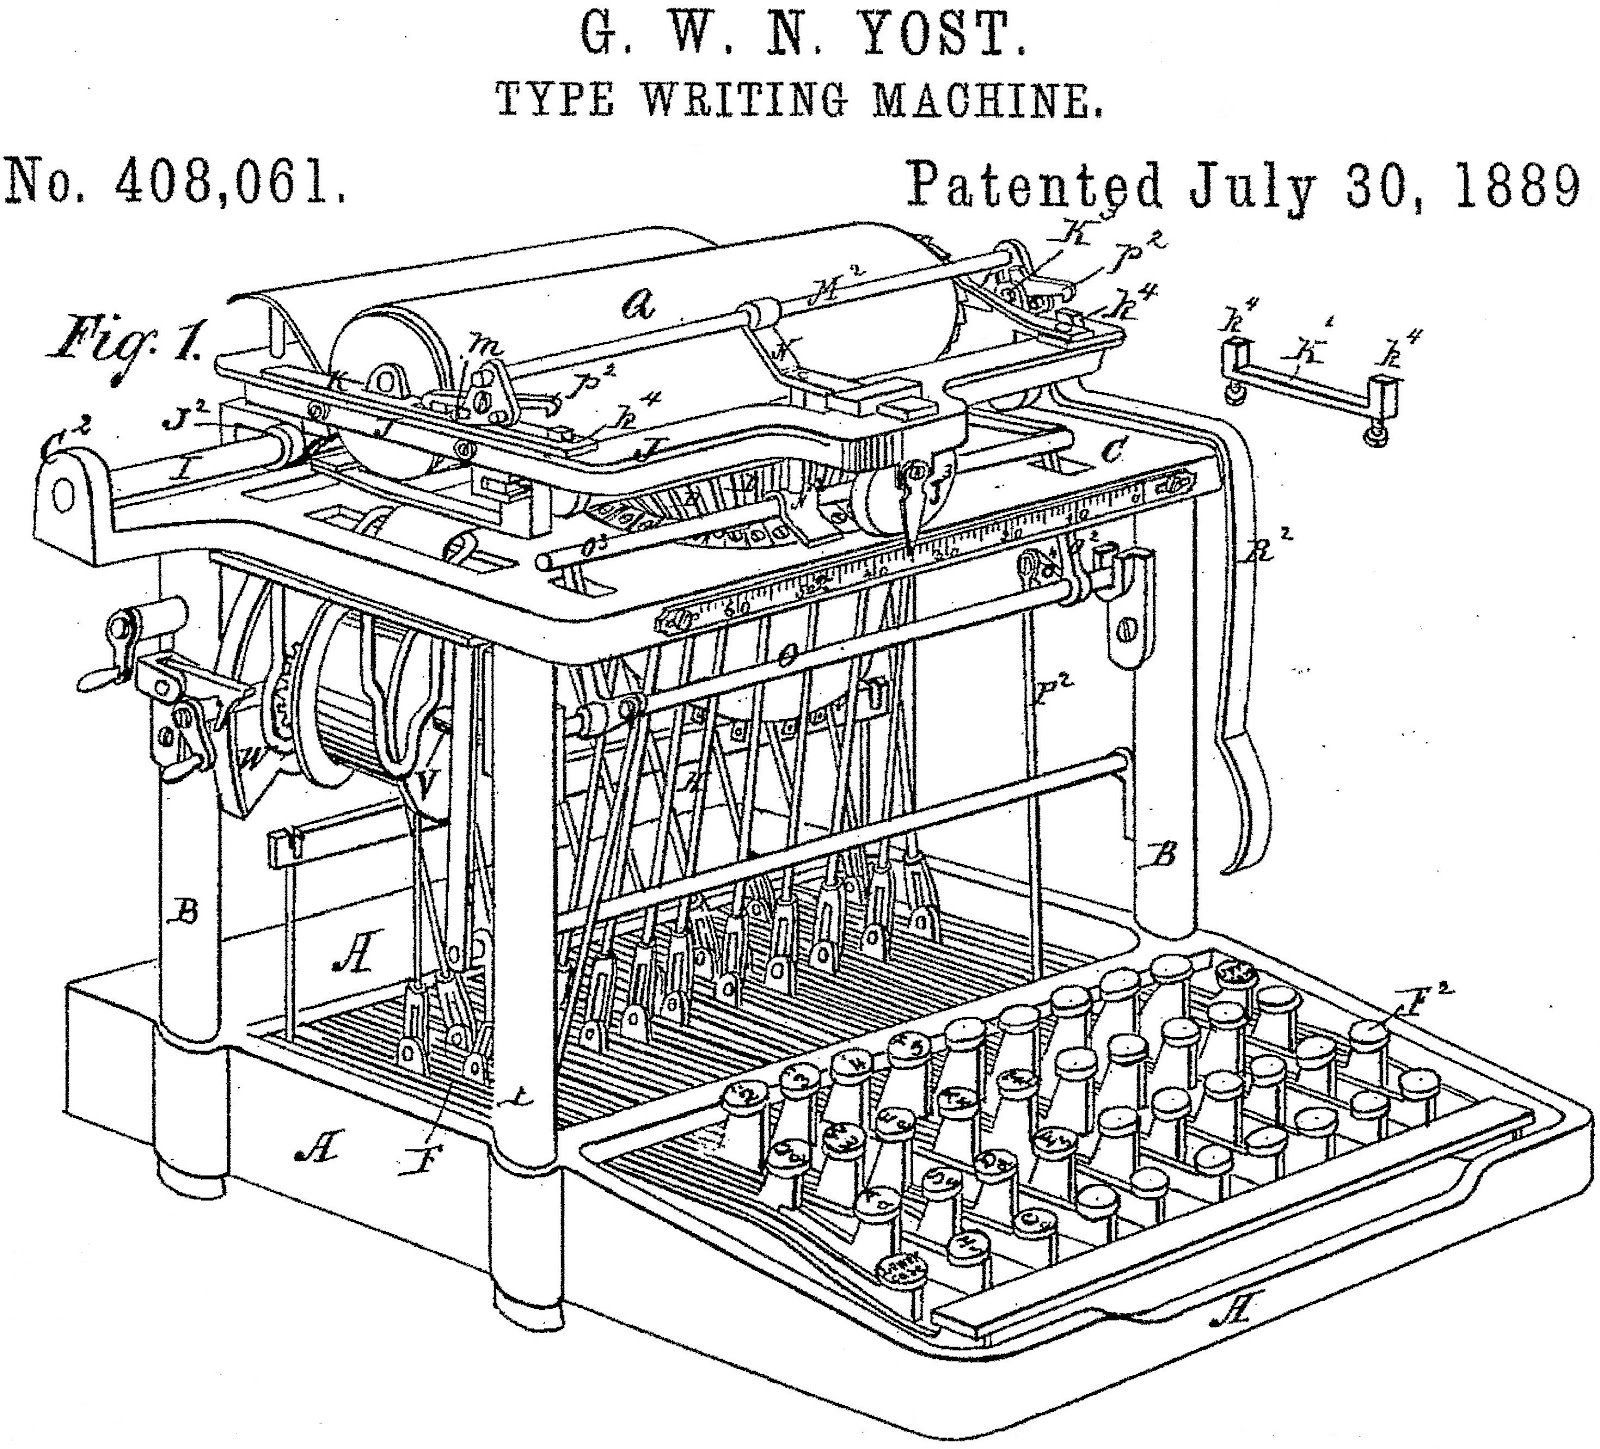 oz.Typewriter: On This Day in Typewriter History: Wagner's